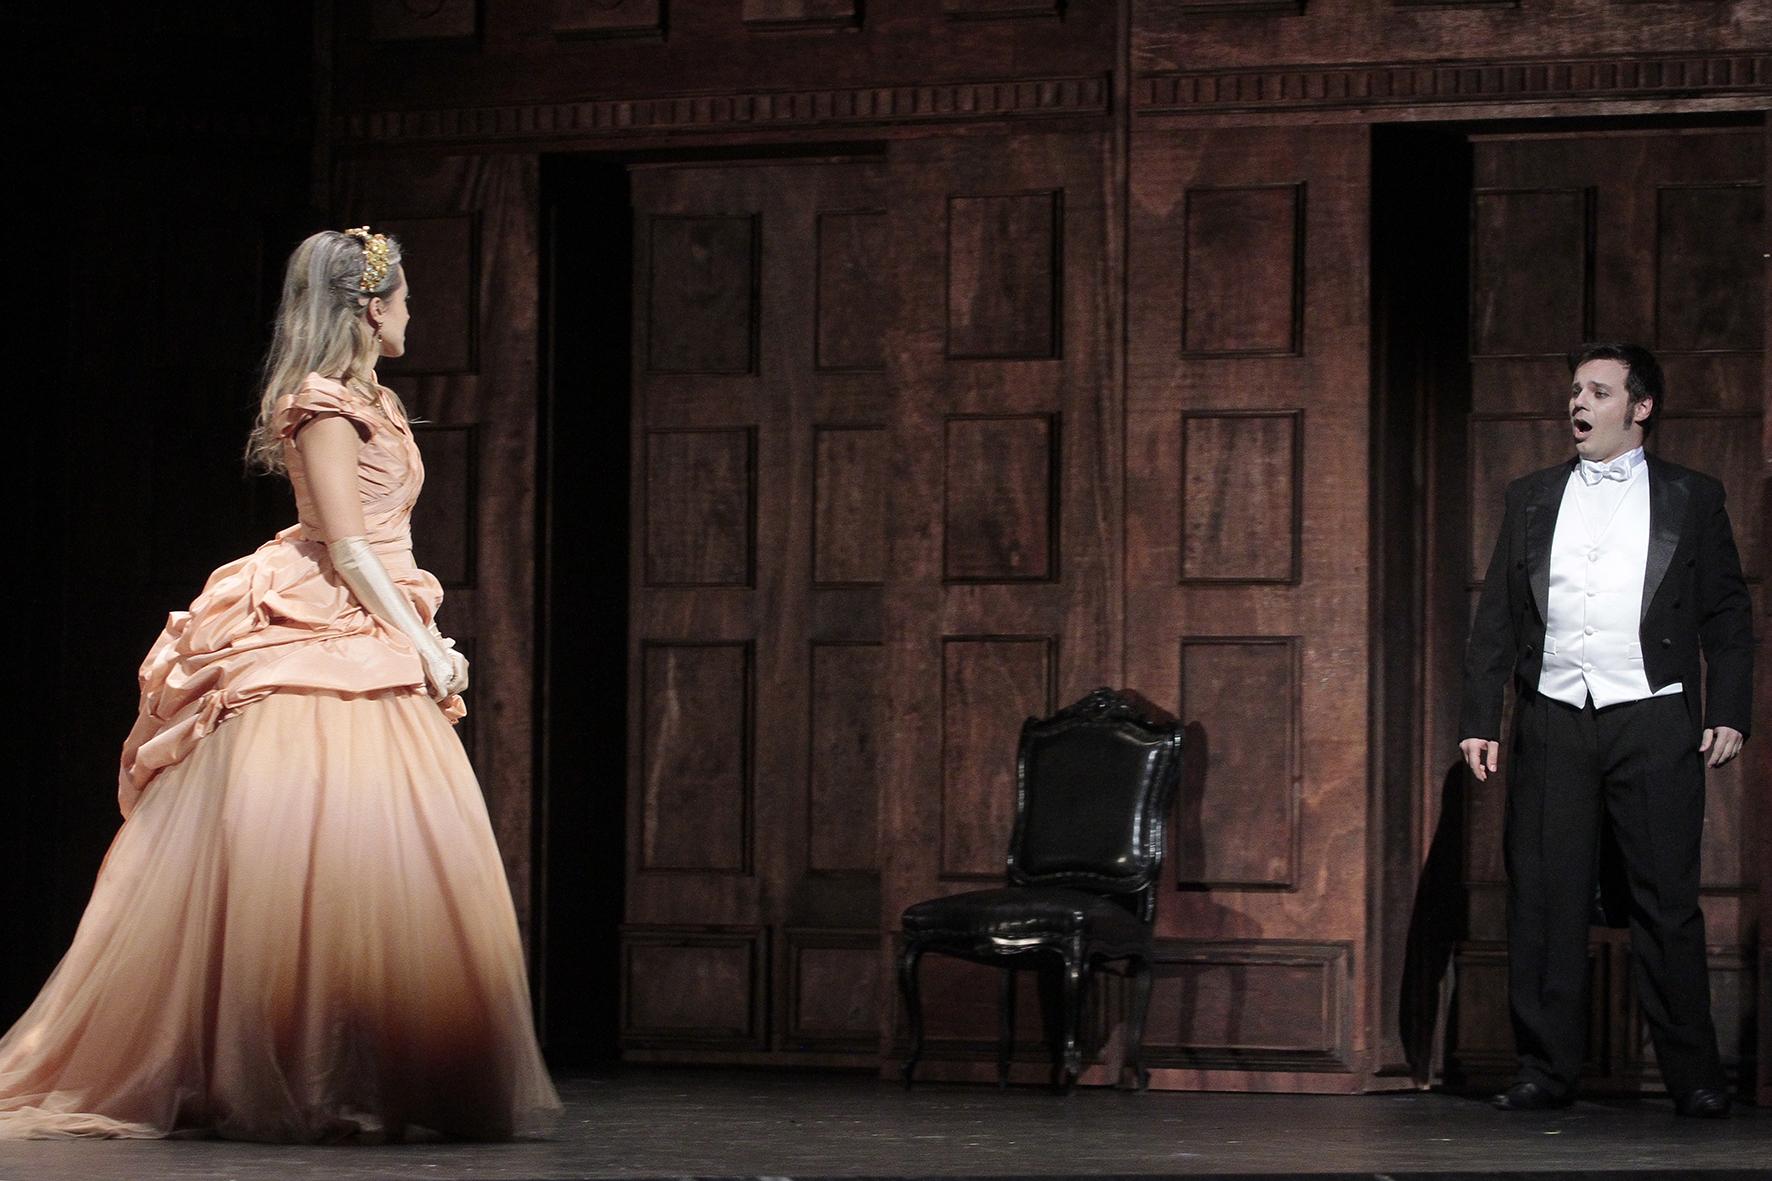 Romeo - Romeo et Juliette  Belo Horizonte, Brazil 2016  Photo by Paulo Lacerda